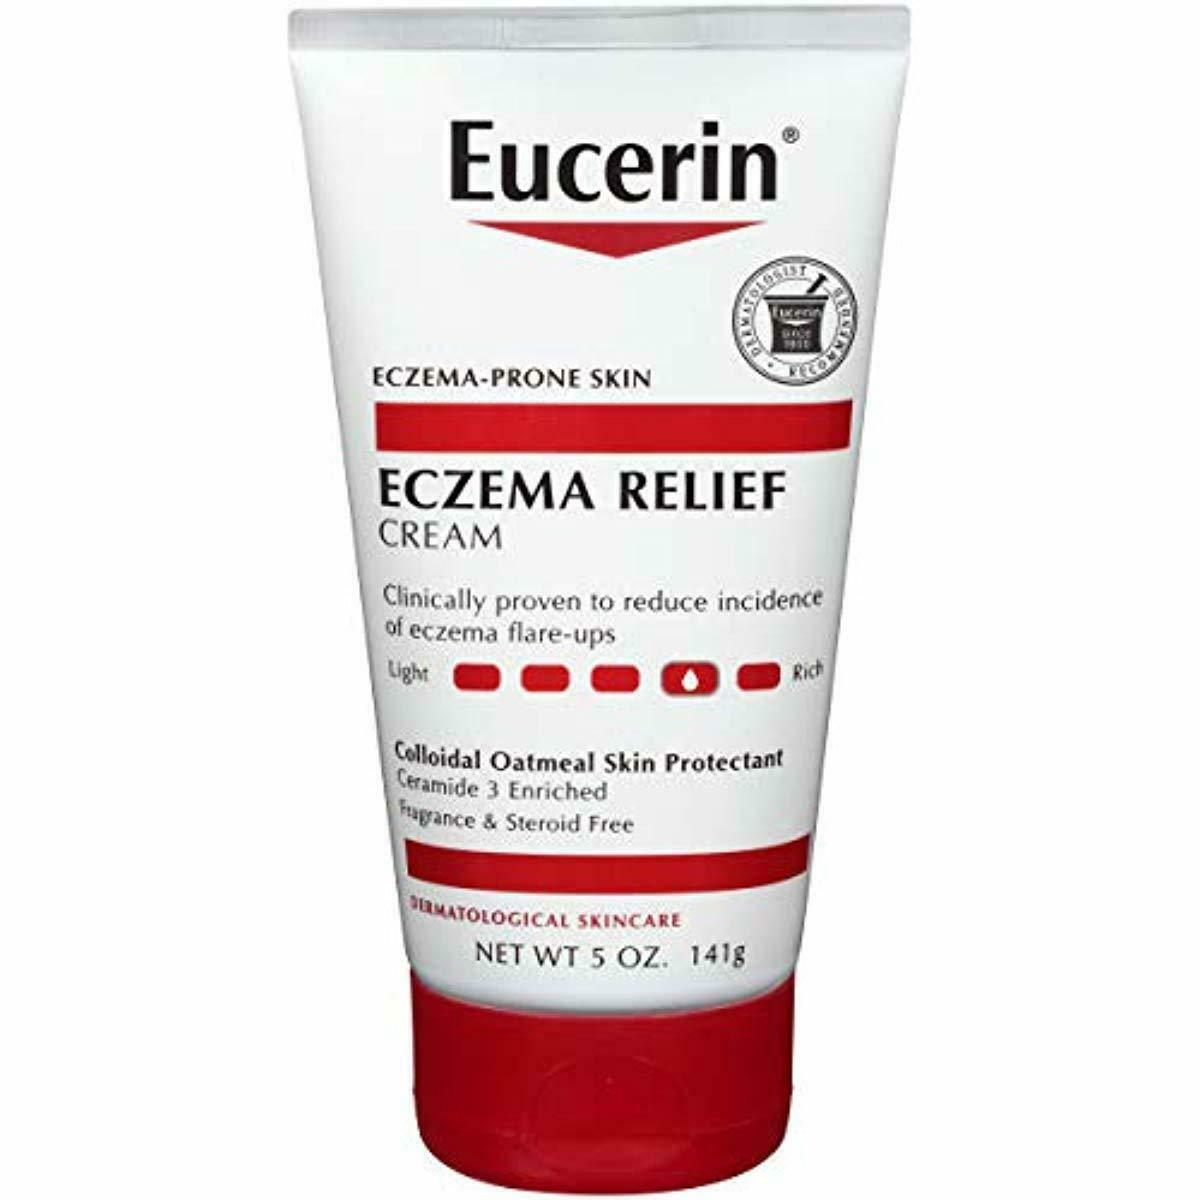 Eucerin Eczema Relief Cream - Full Body Lotion for Eczema-Pr